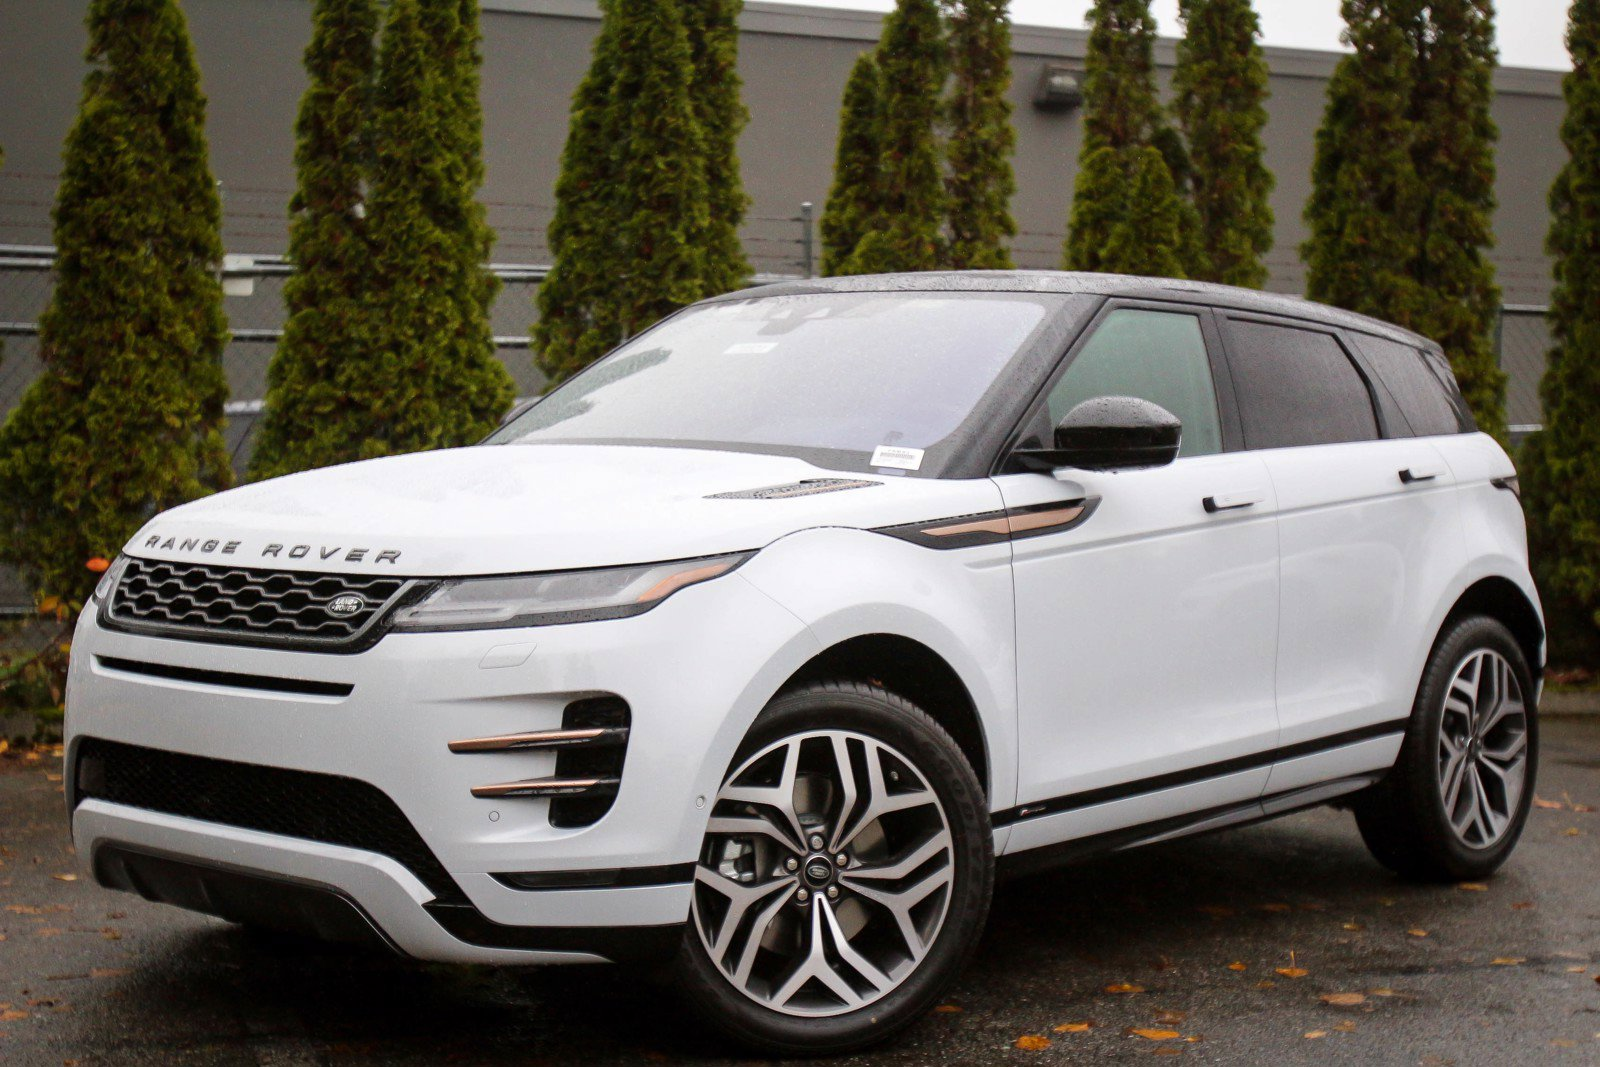 New 2020 Land Rover Range Rover Evoque First Edition